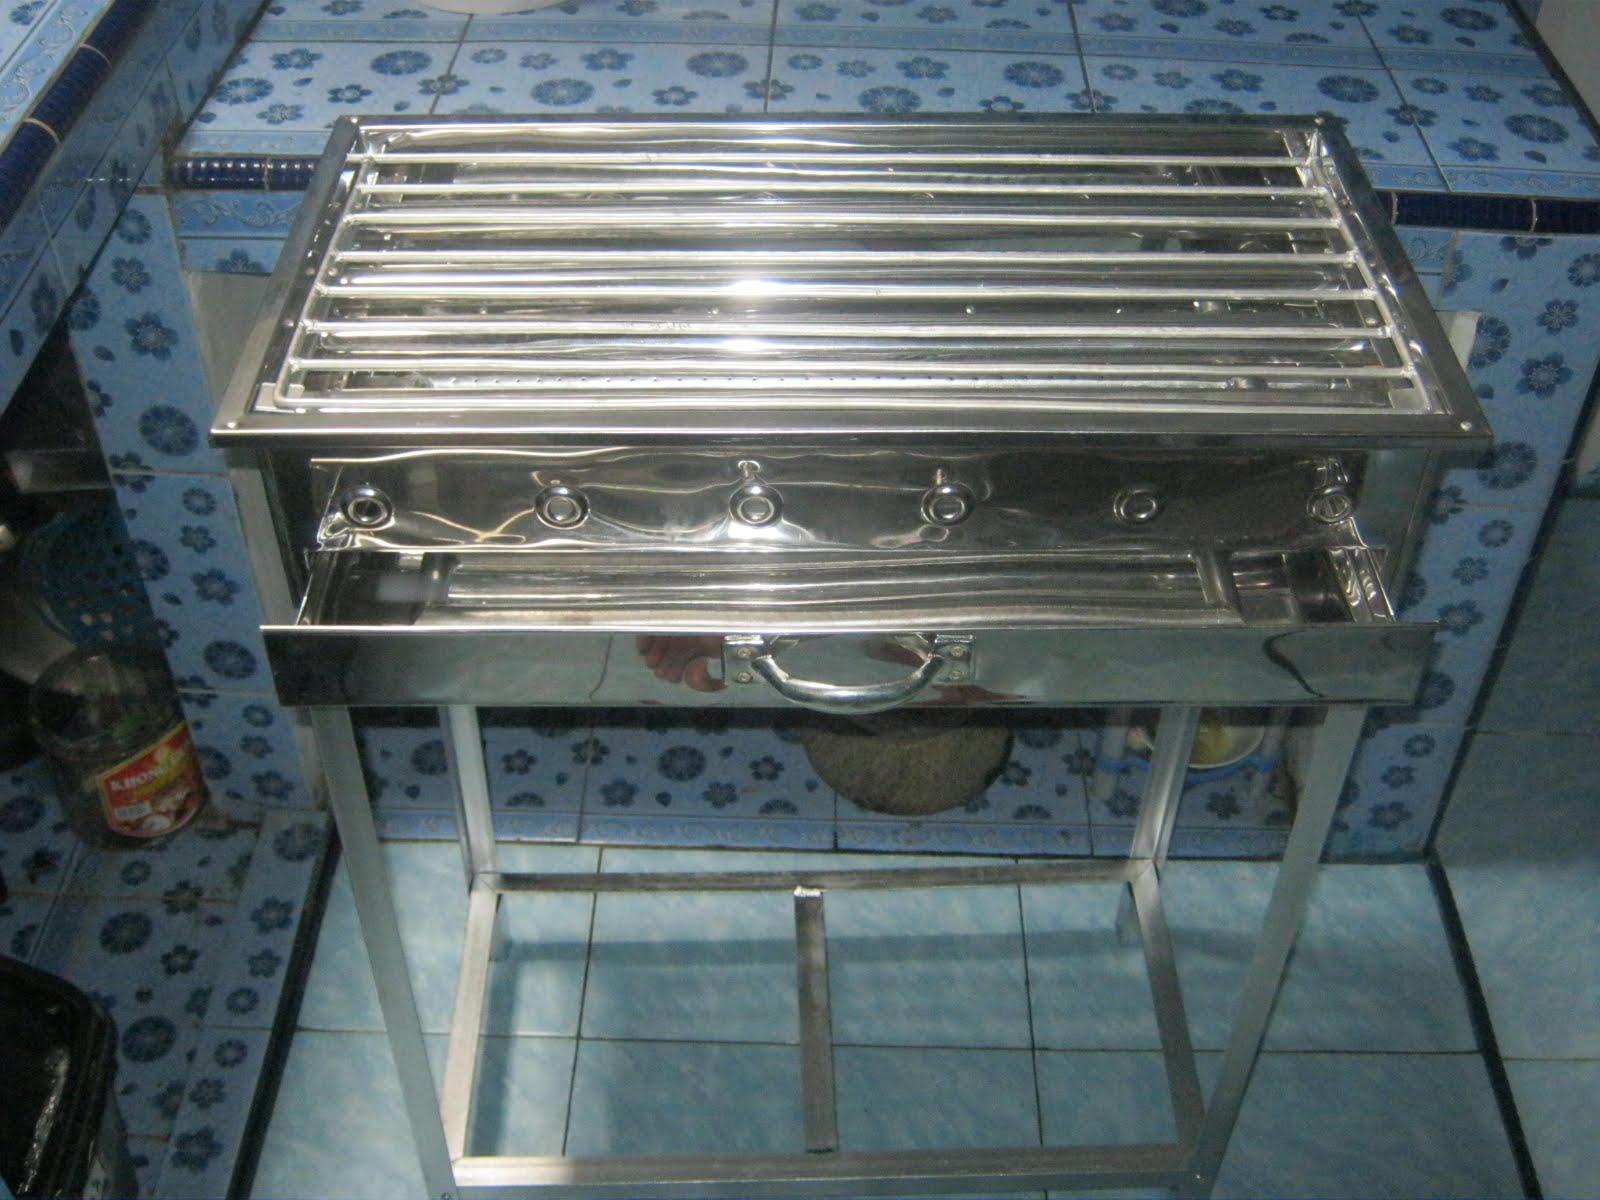 Panggangan Sate (Bahan Bakar Gas / Arang)